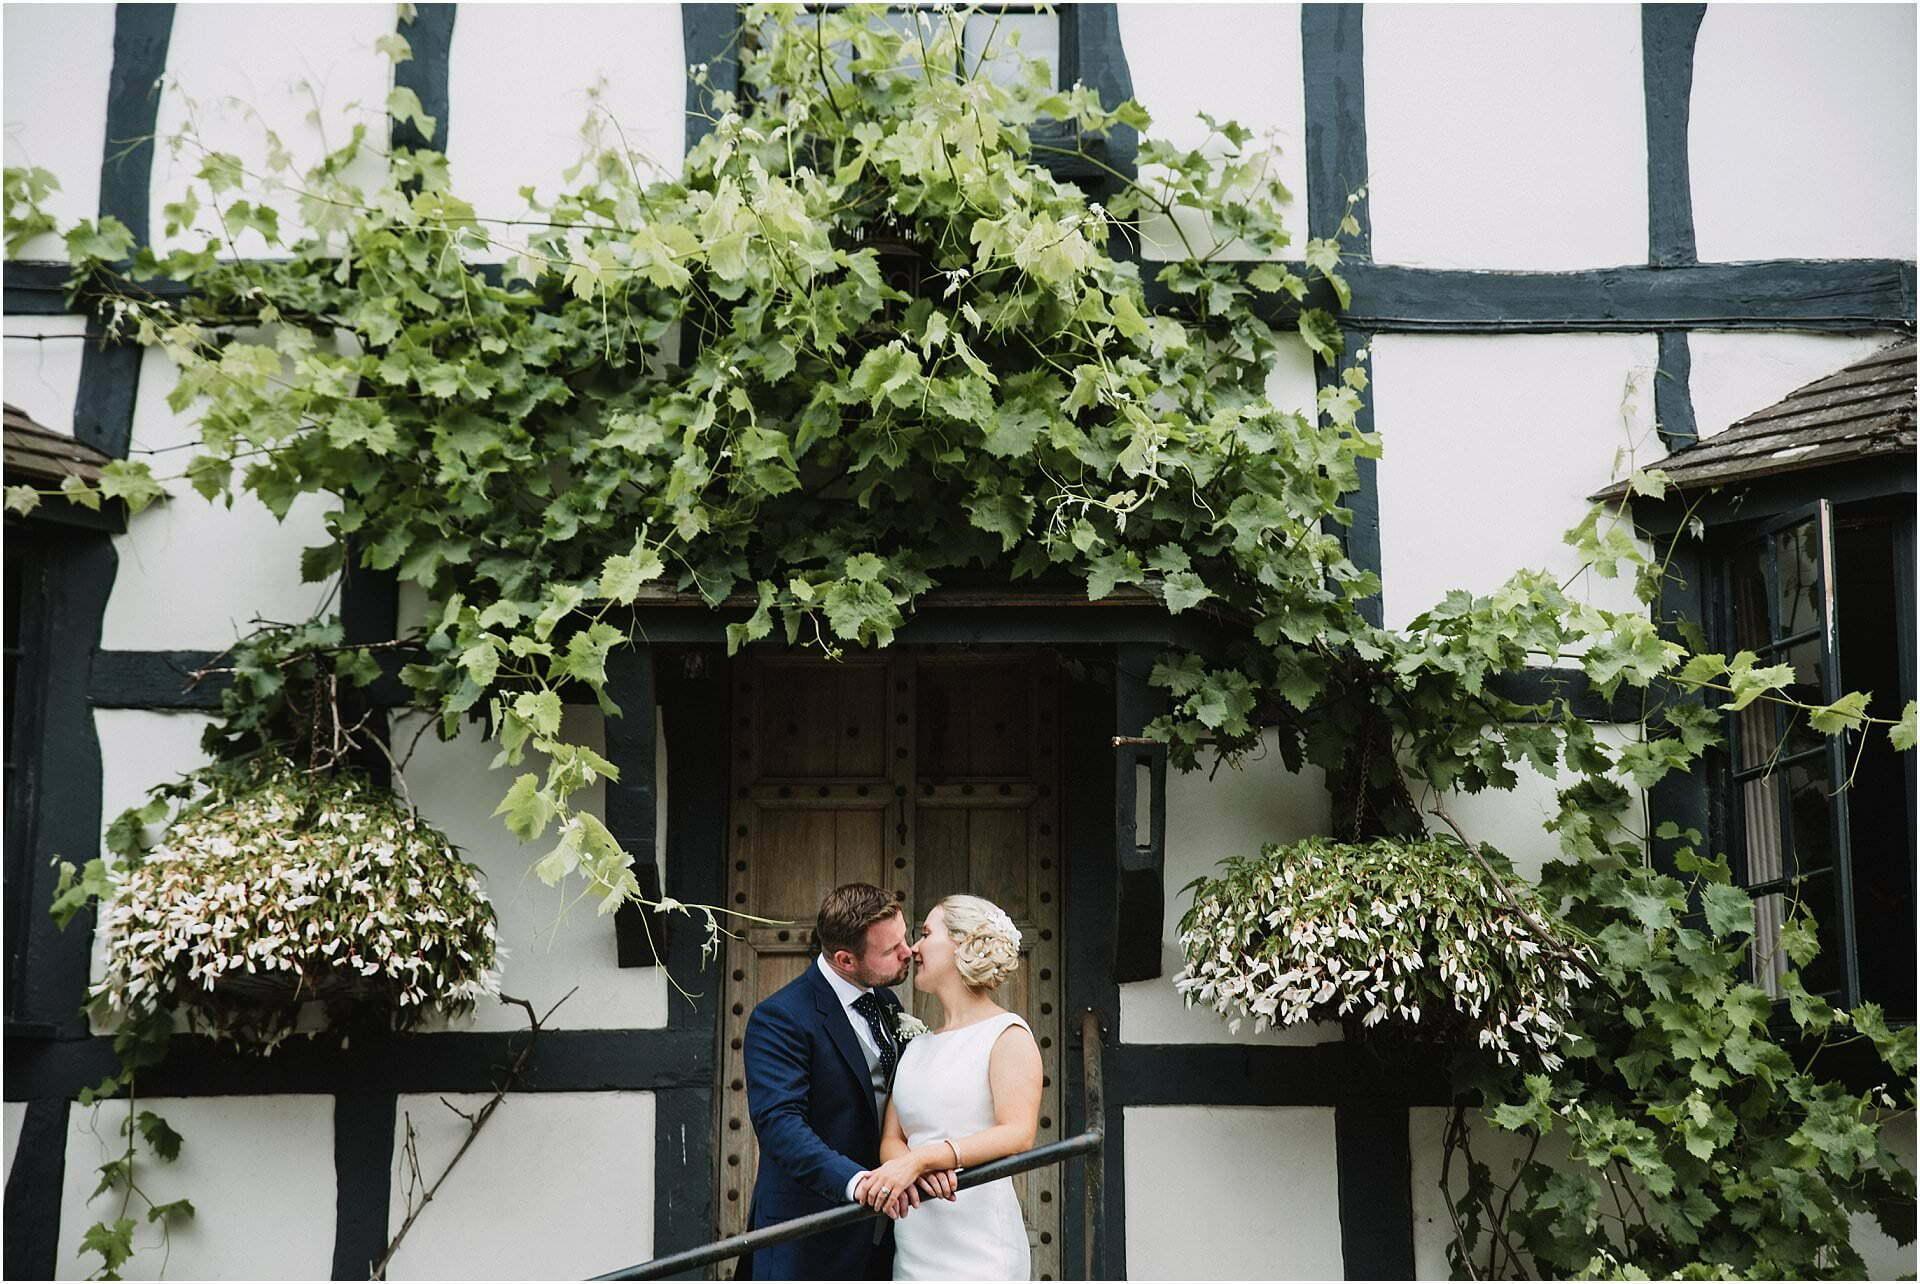 Green Man Hereford Herefordshire wedding